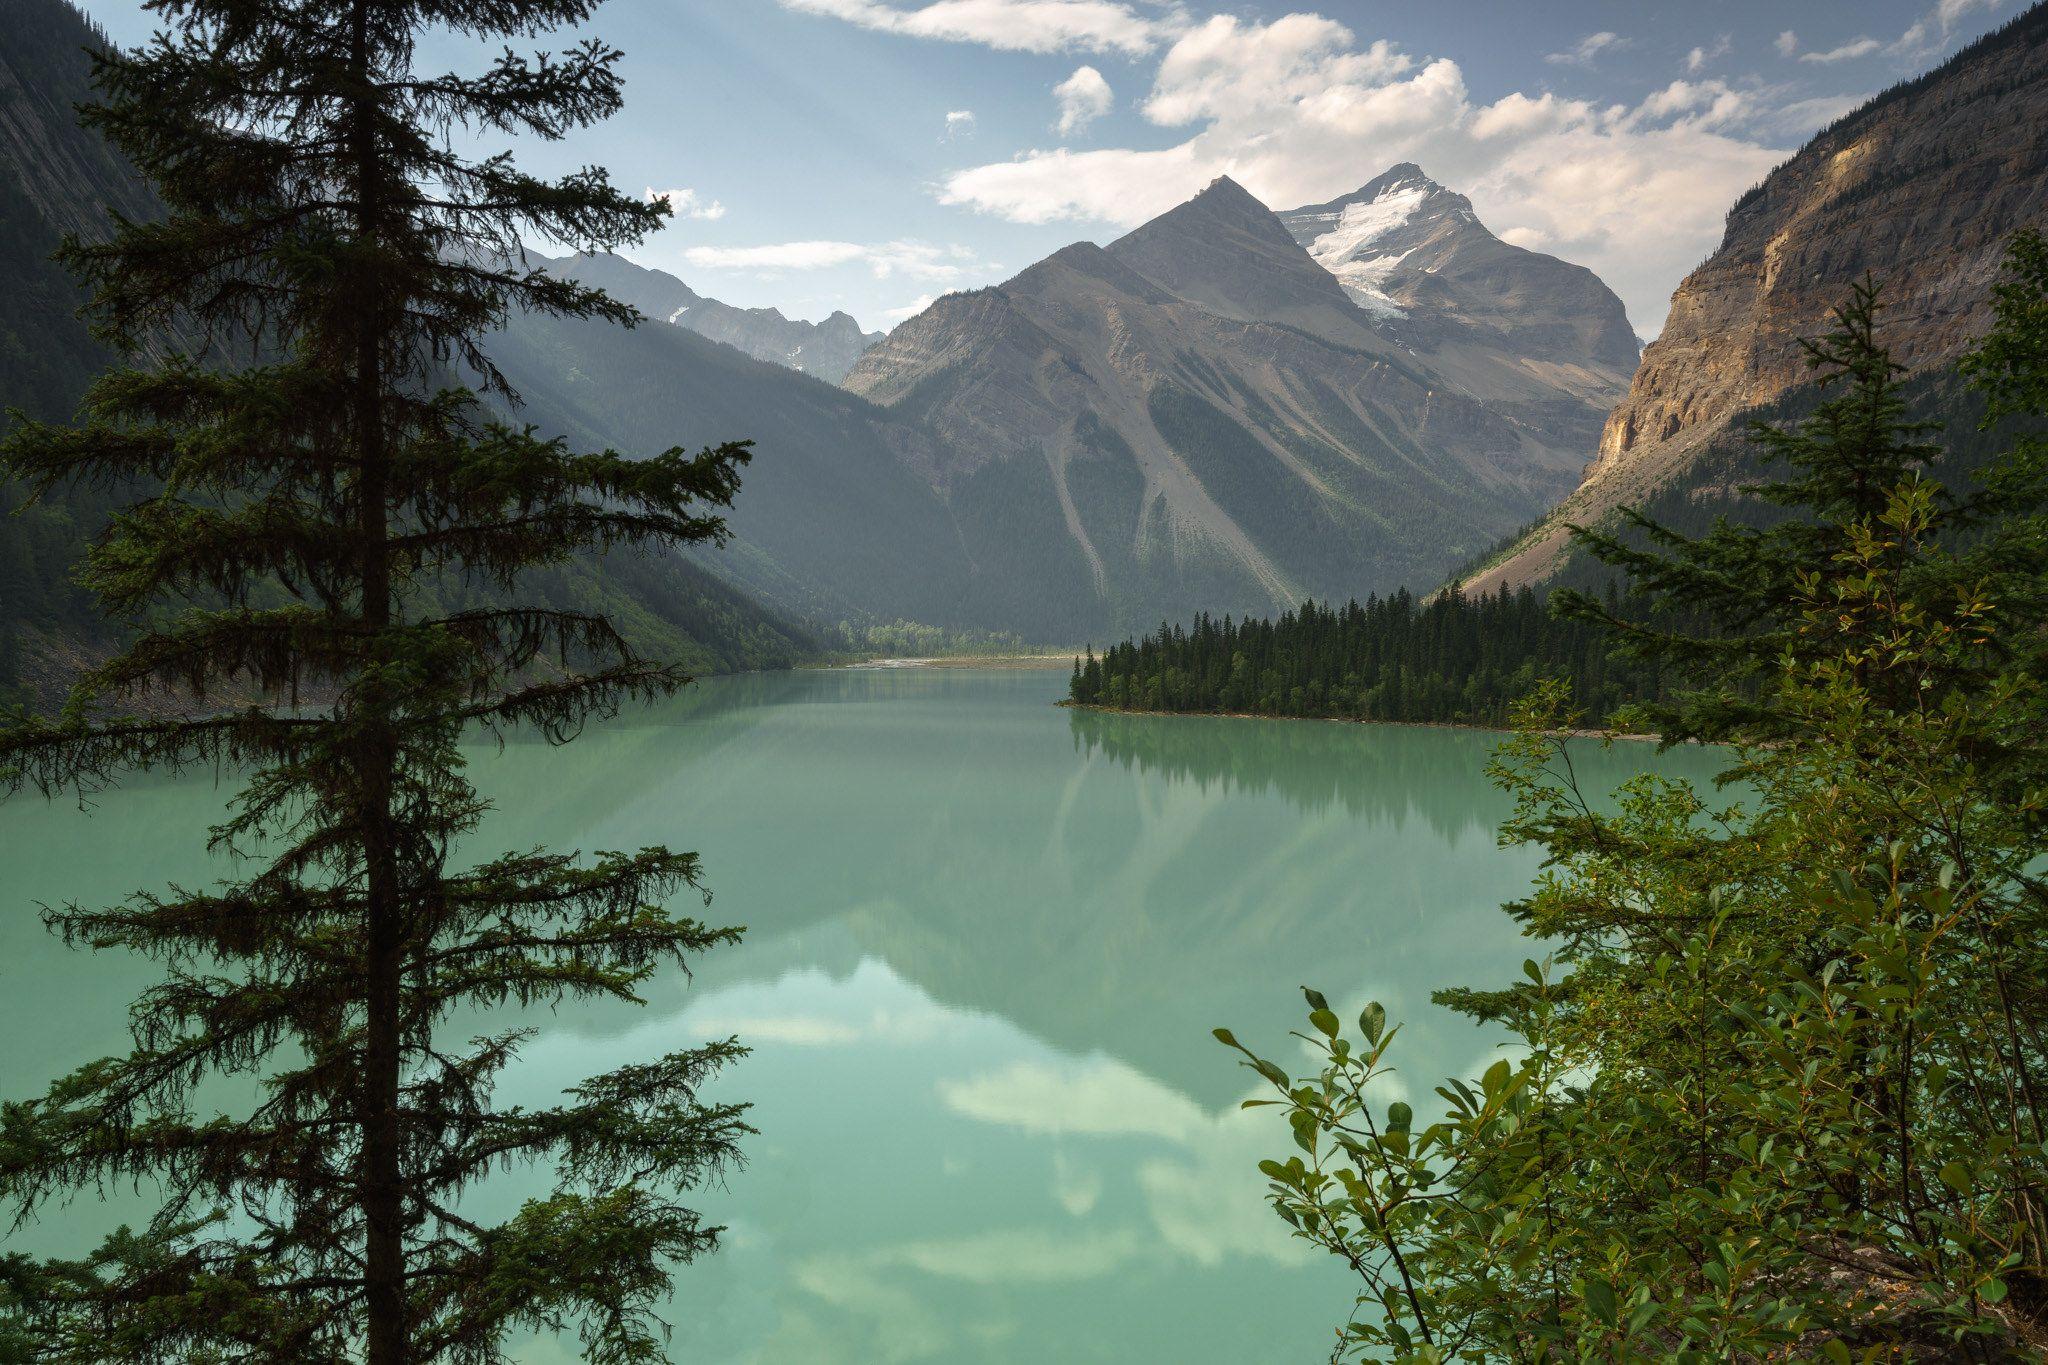 https://flic.kr/p/z3DDK3 | Paradise | Kinney Lake along the Berg Lake Trail. A little piece of paradise.